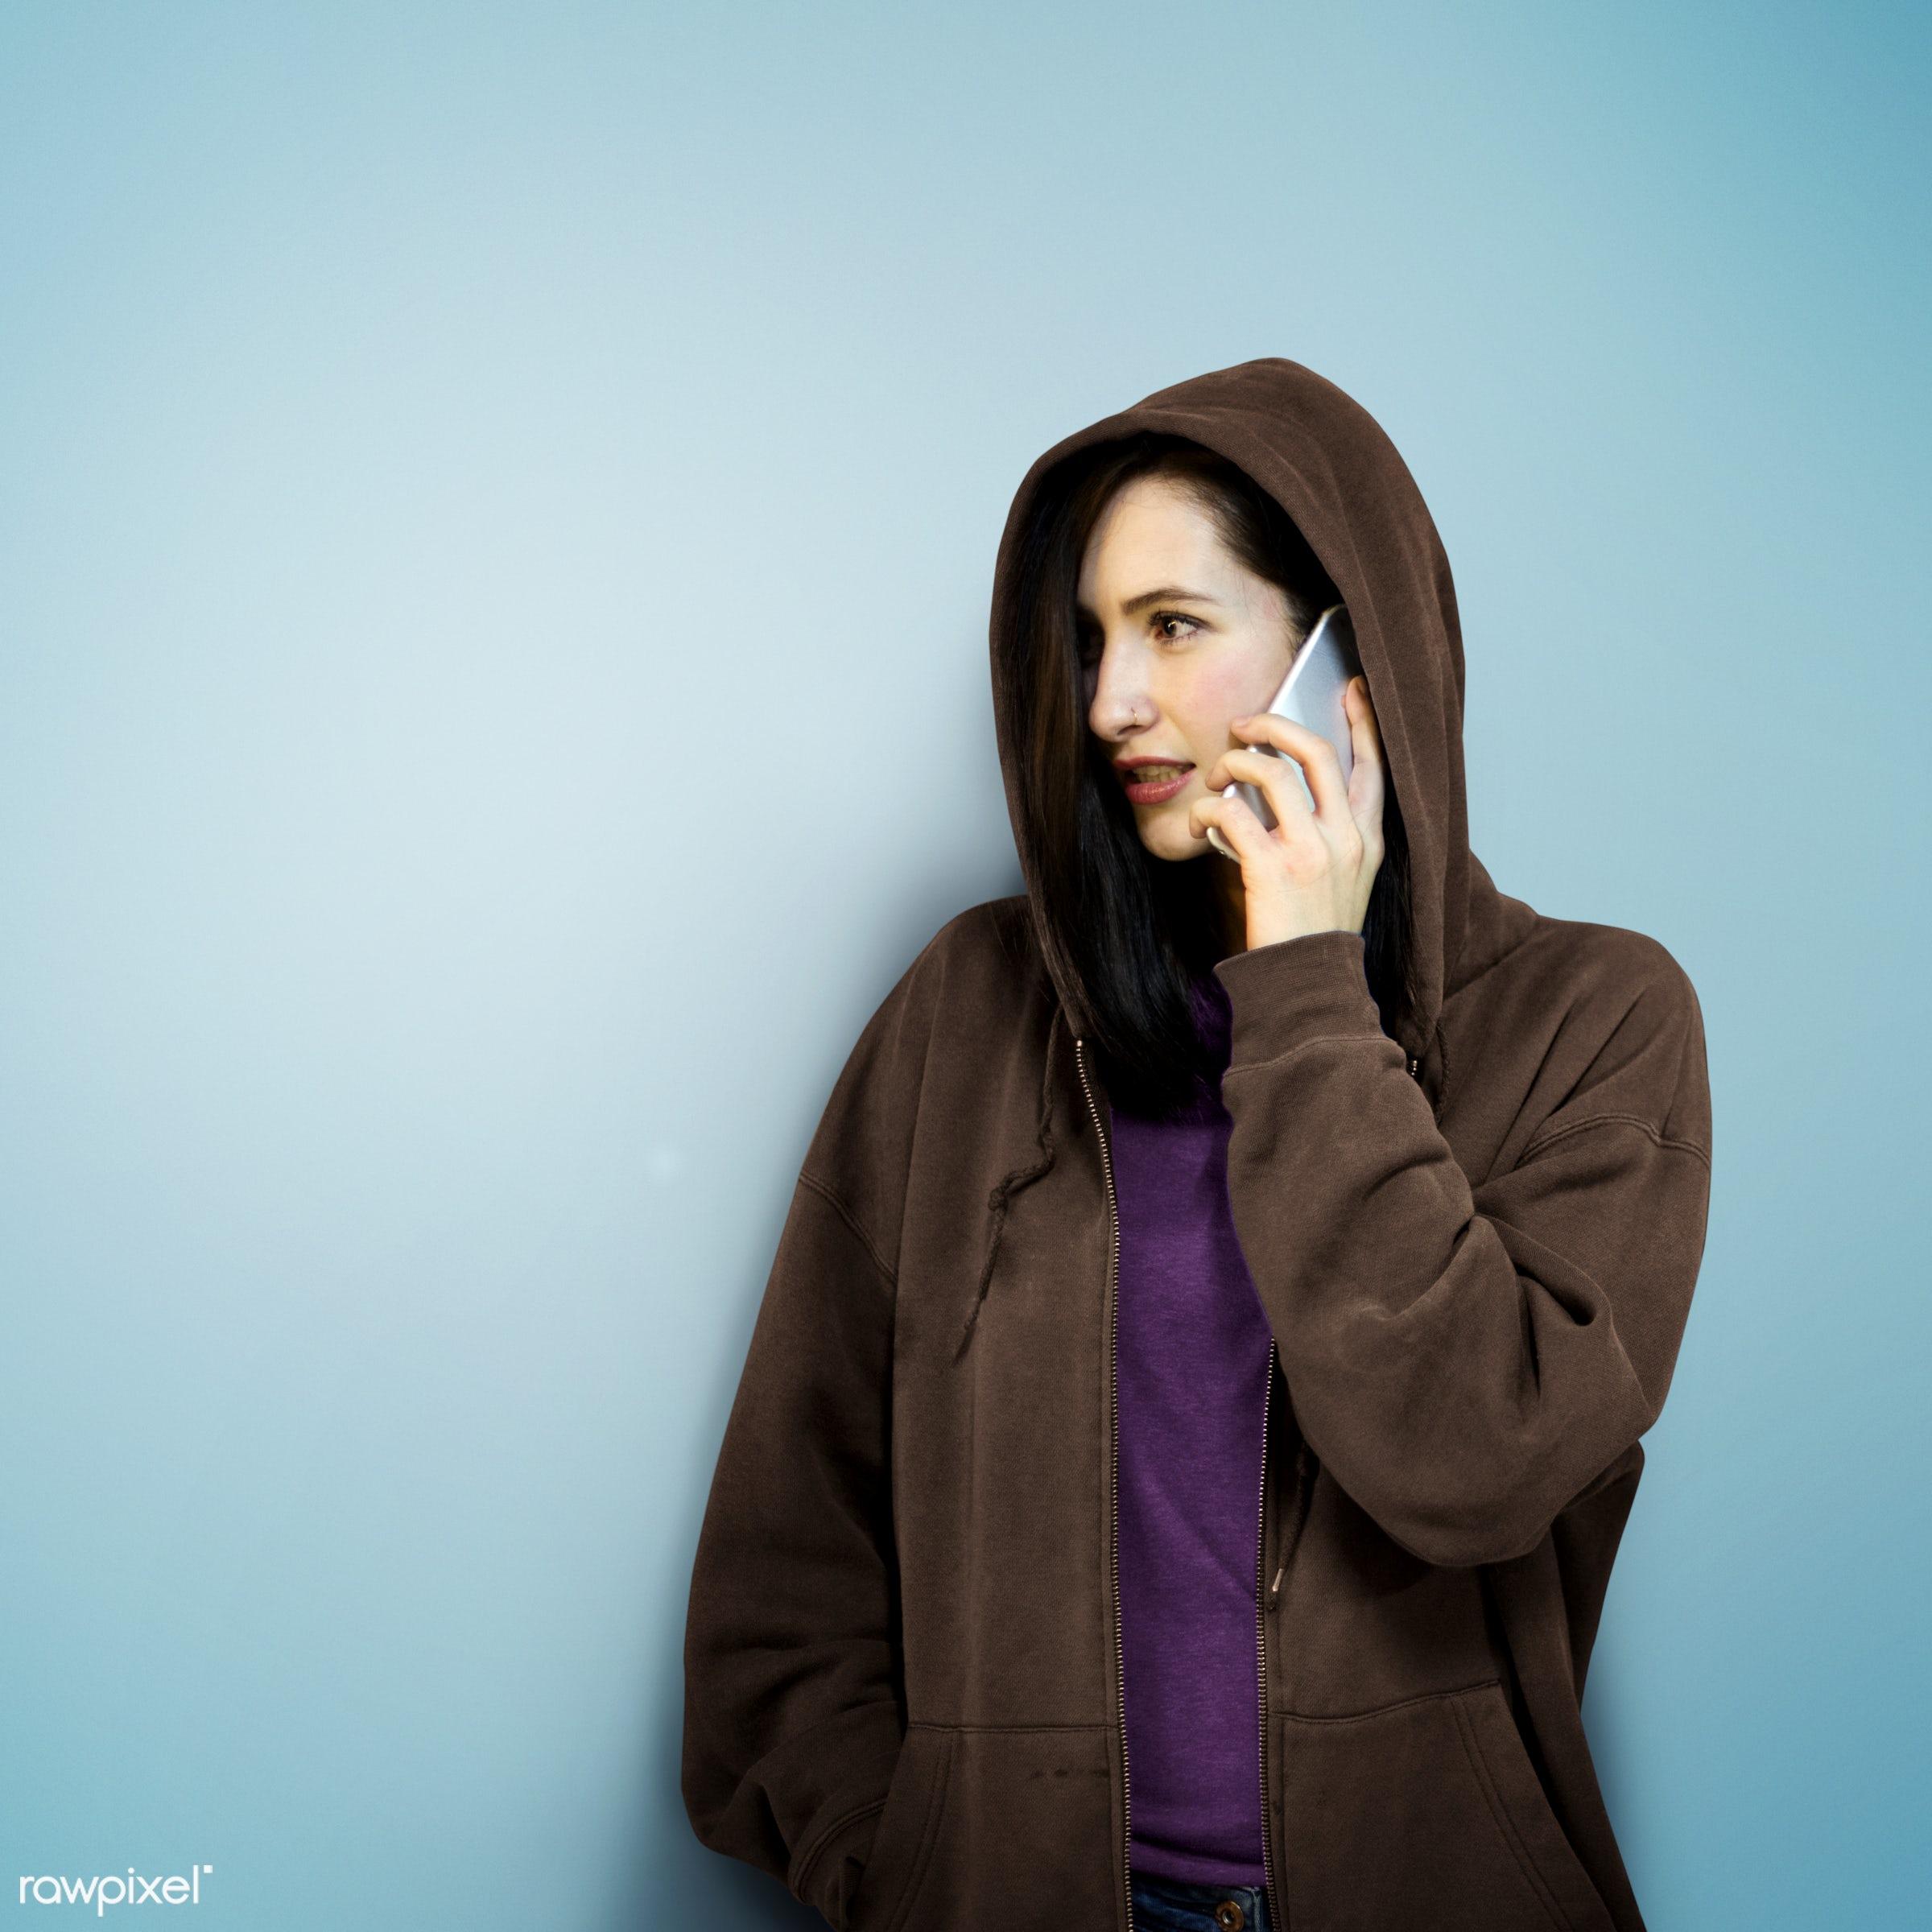 agent, behind, closeup, criminal, curiosity, detective, eyesight, female, femininity, feminism, girl, hidden, hiding,...